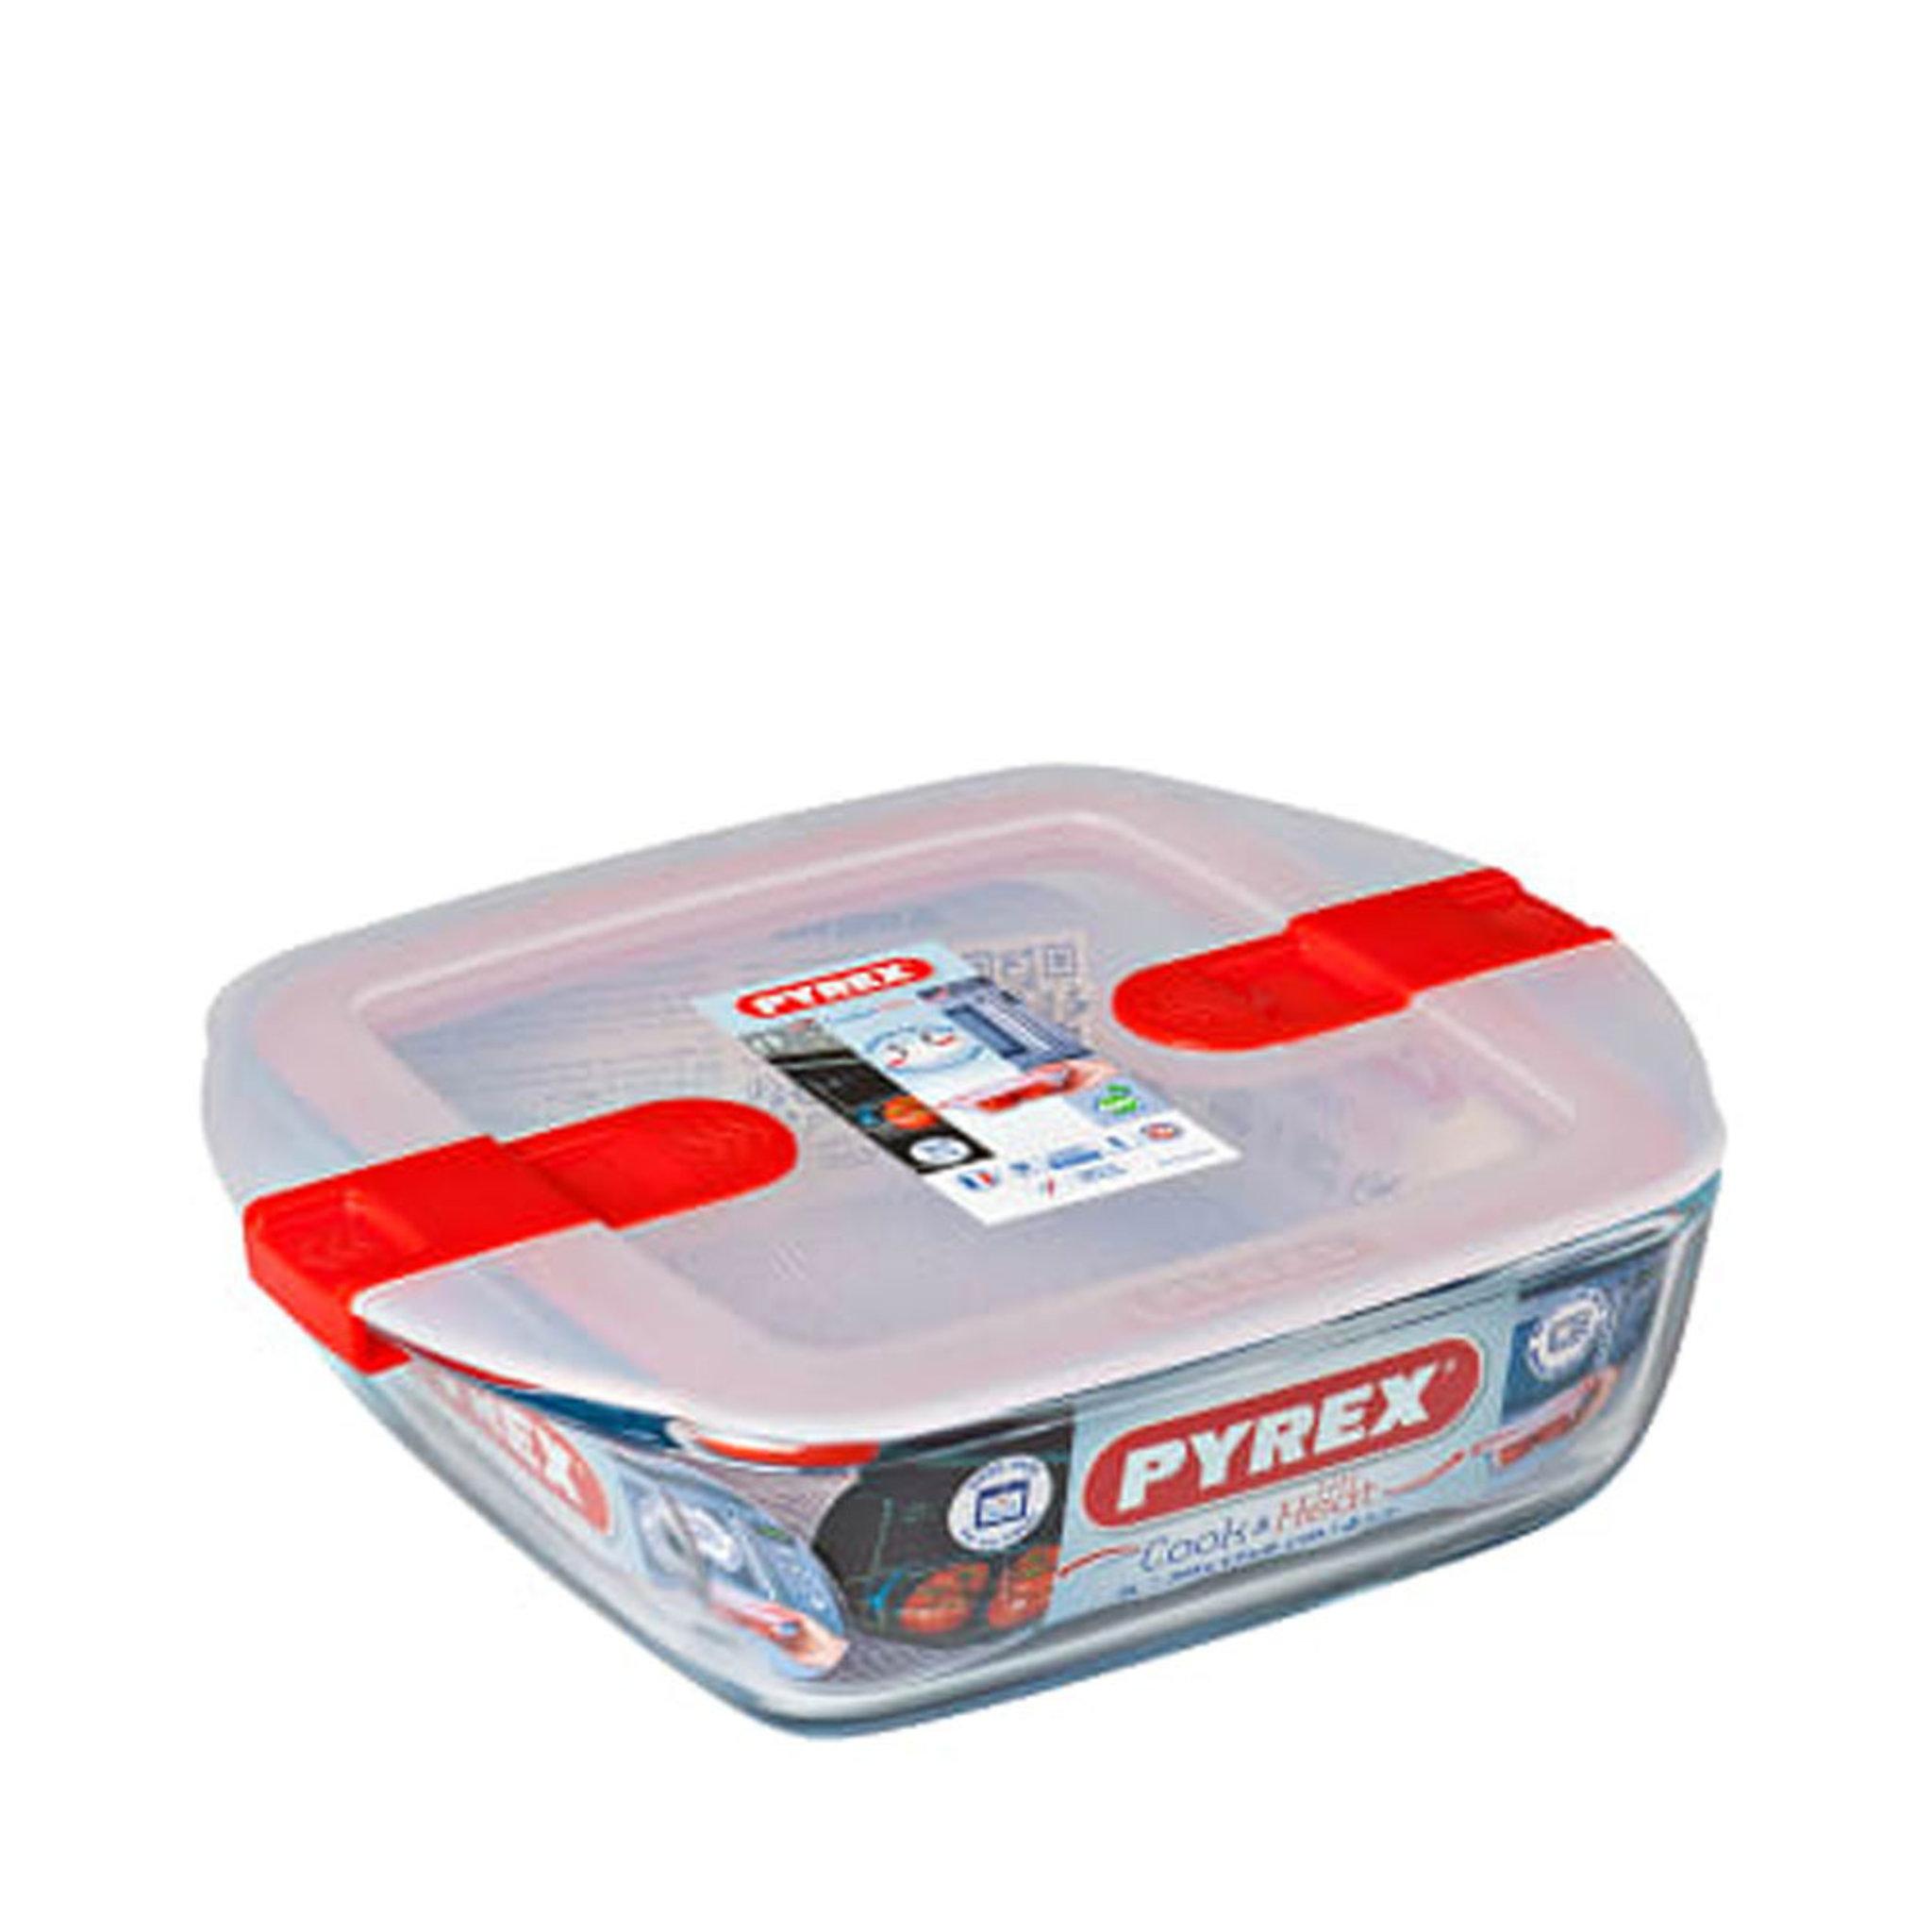 Ugnsform/Matlåda Cook and Heat med lock 1 liter